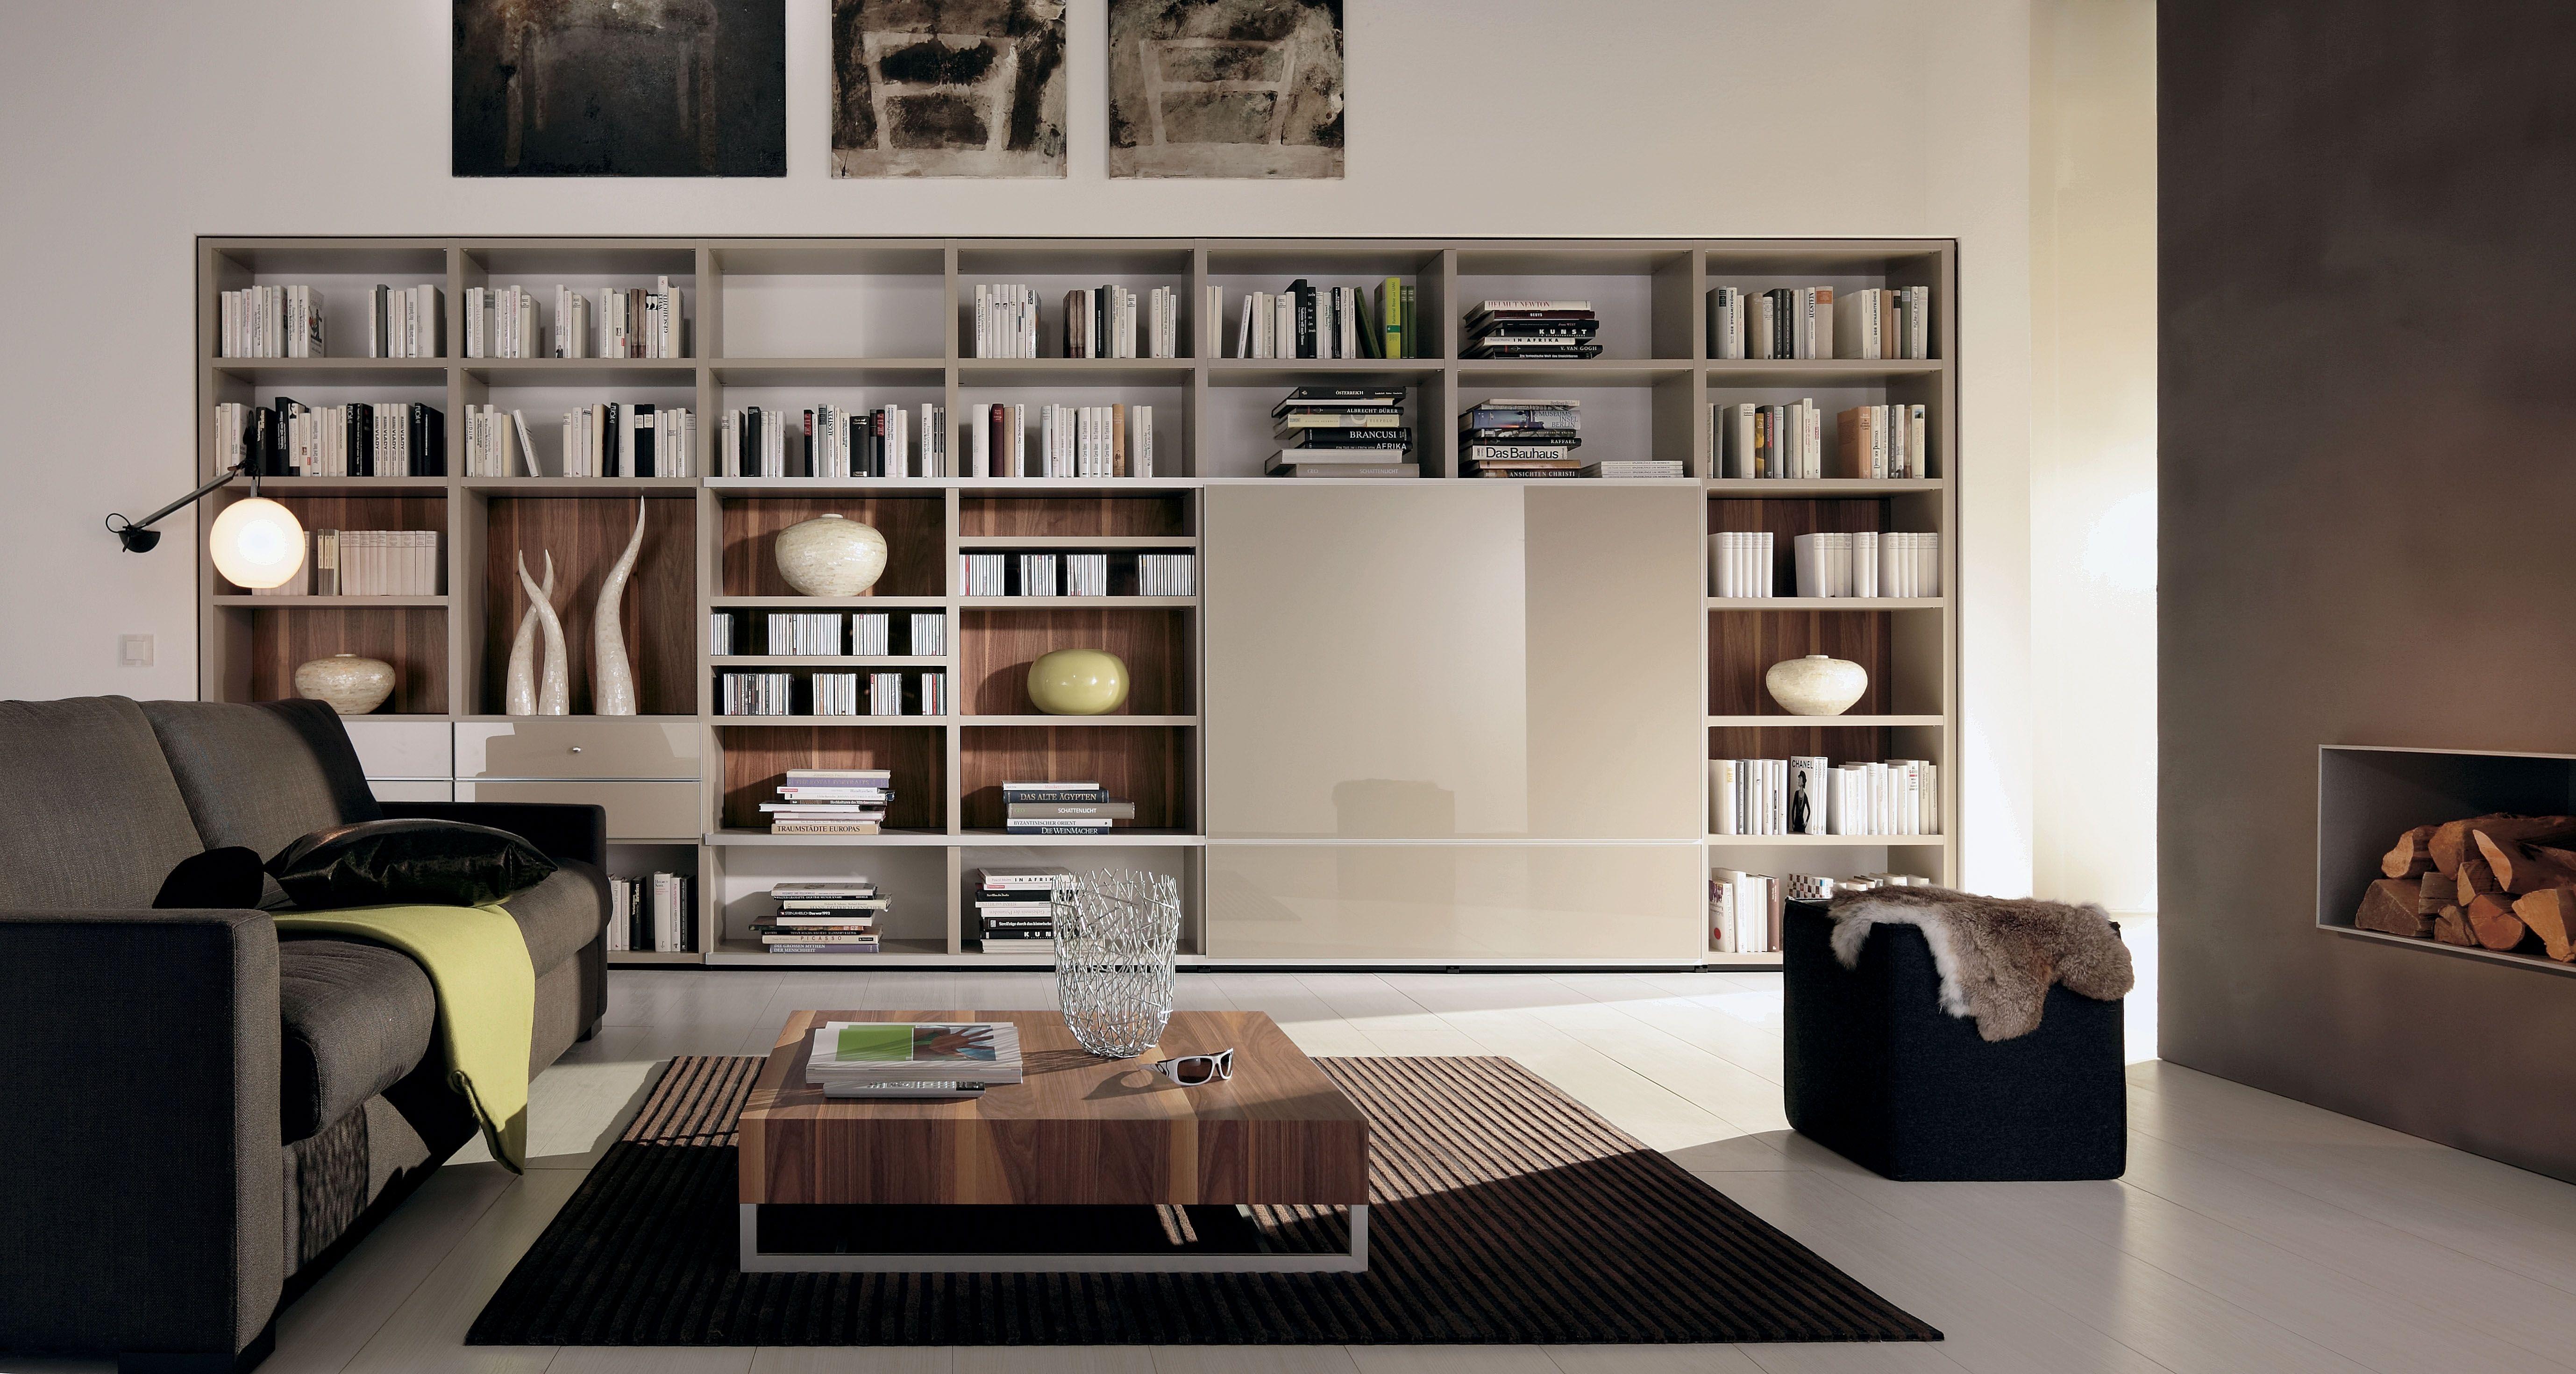 Book Storage Ideas For Living Room Bookshelves In Living Room Living Room Furniture Sale Home Library Design